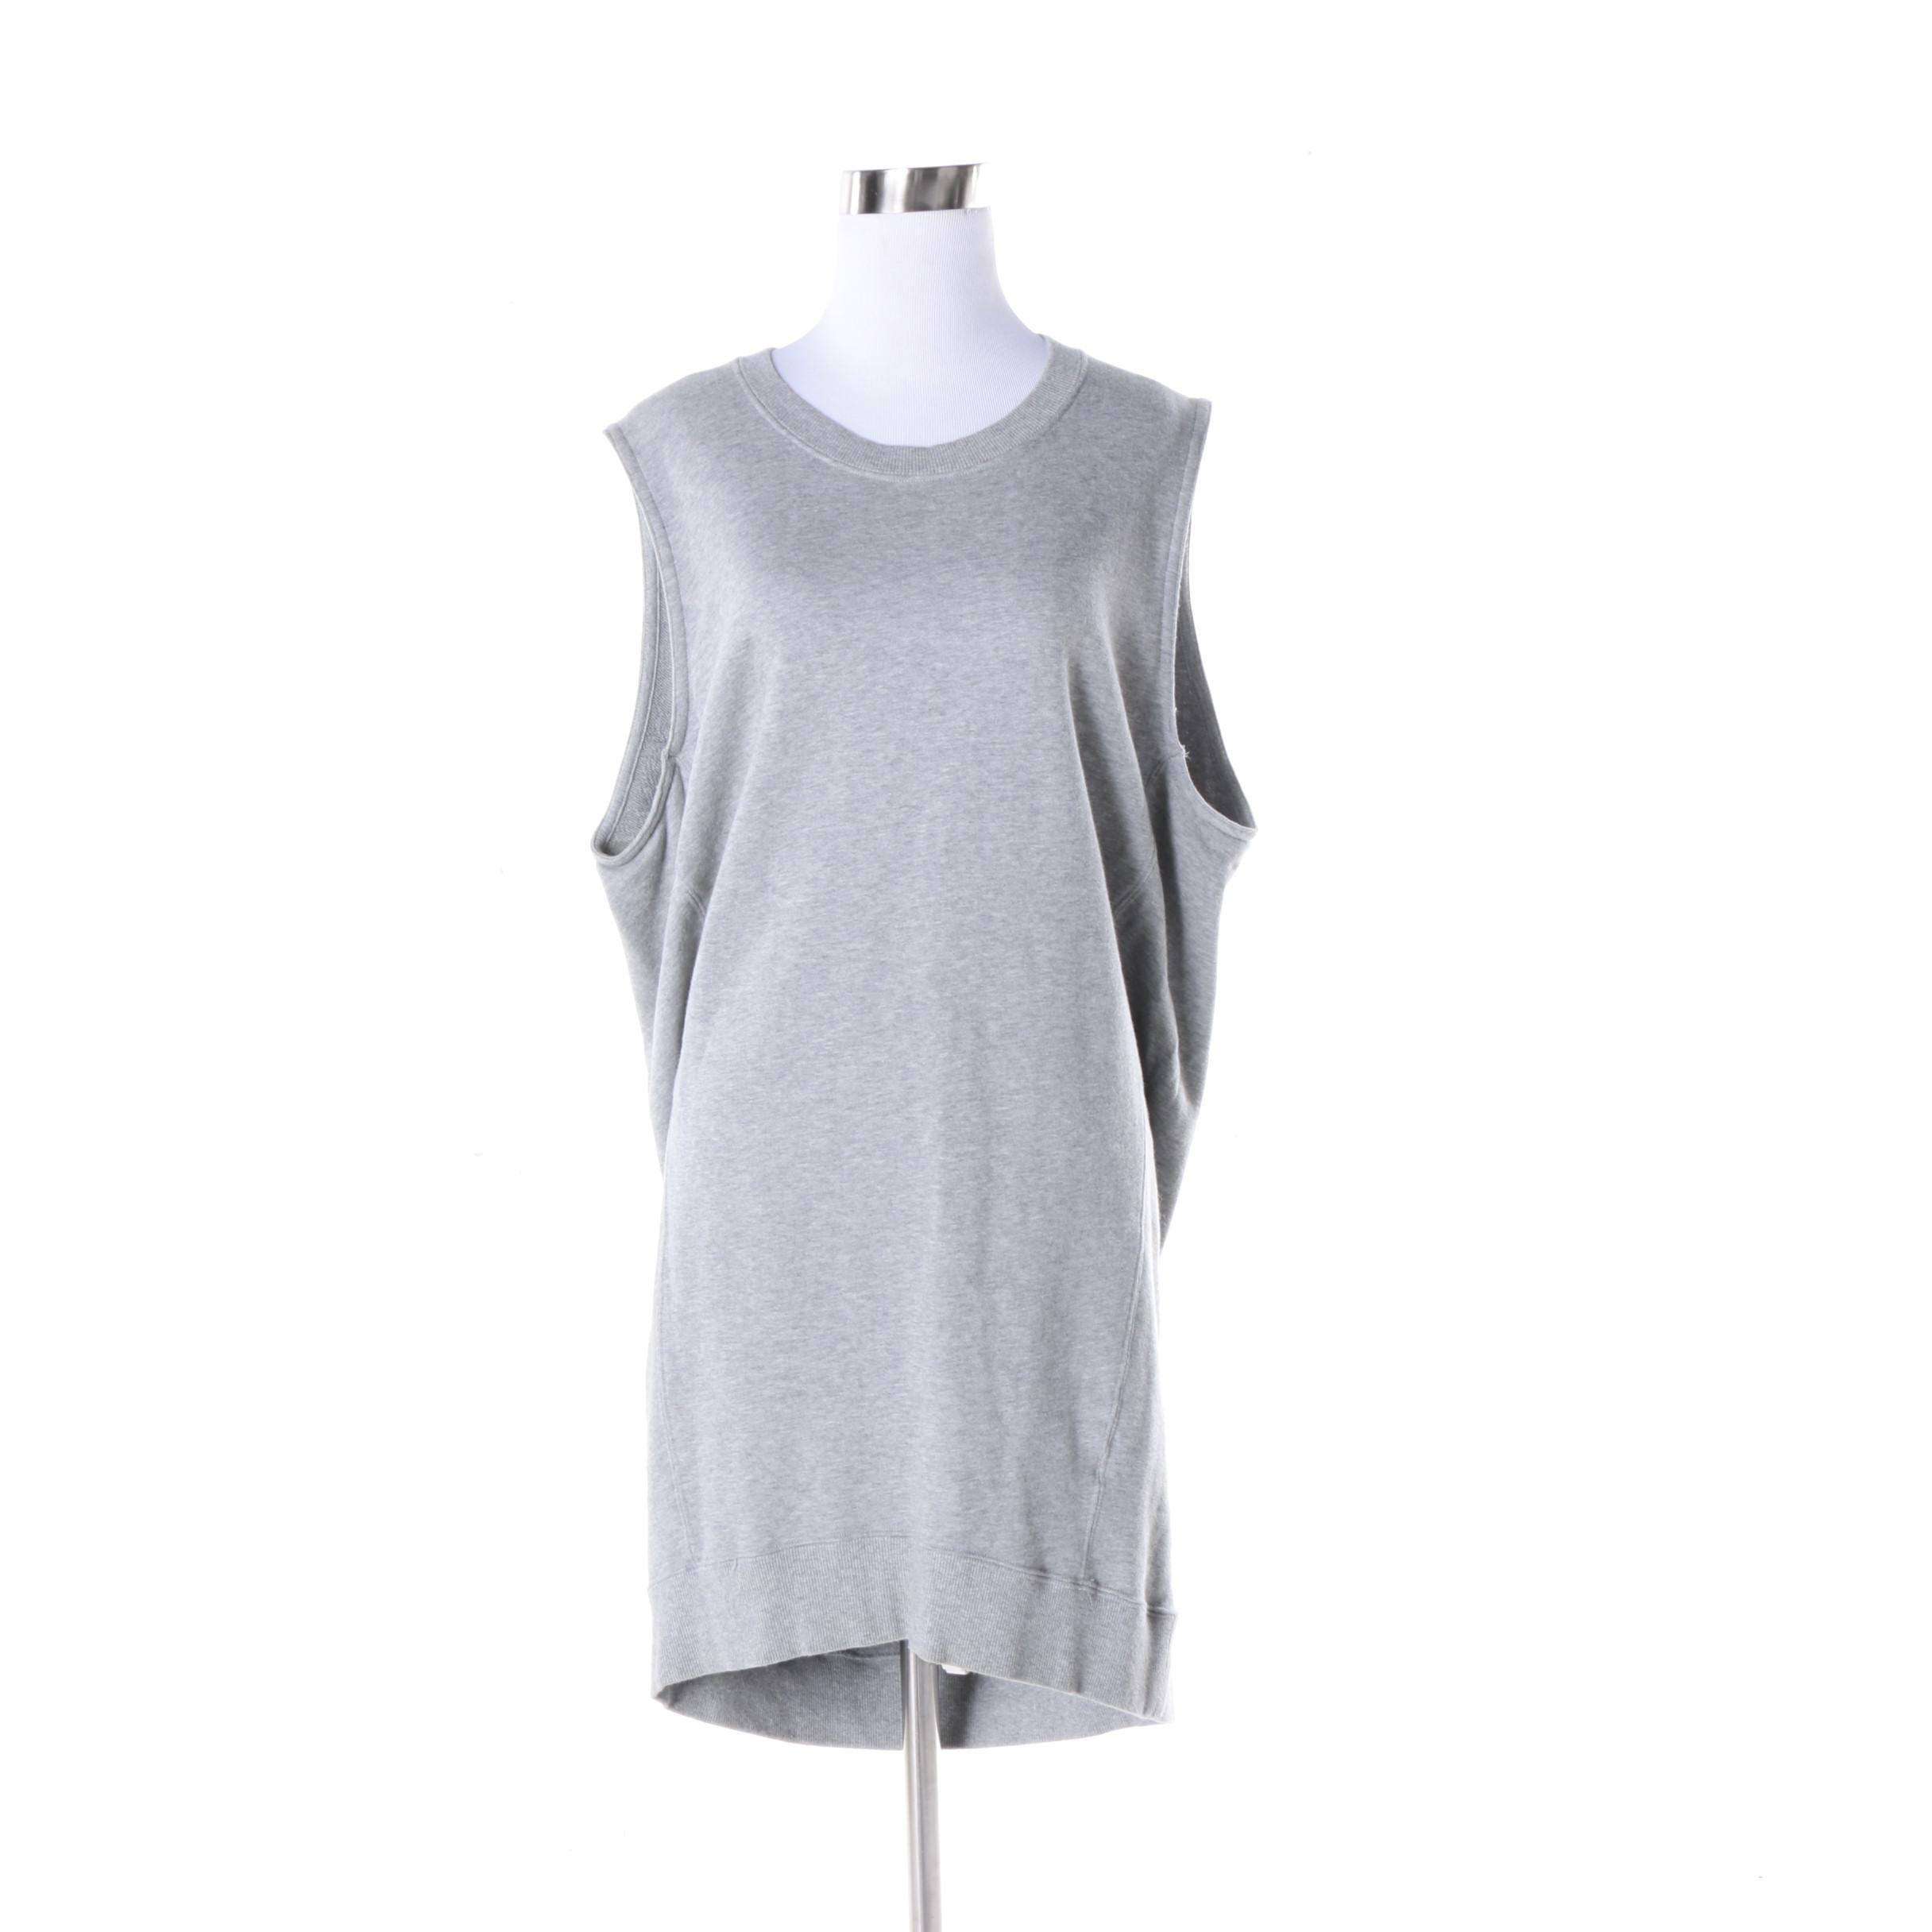 Acne Studios Sweatshirt Dress